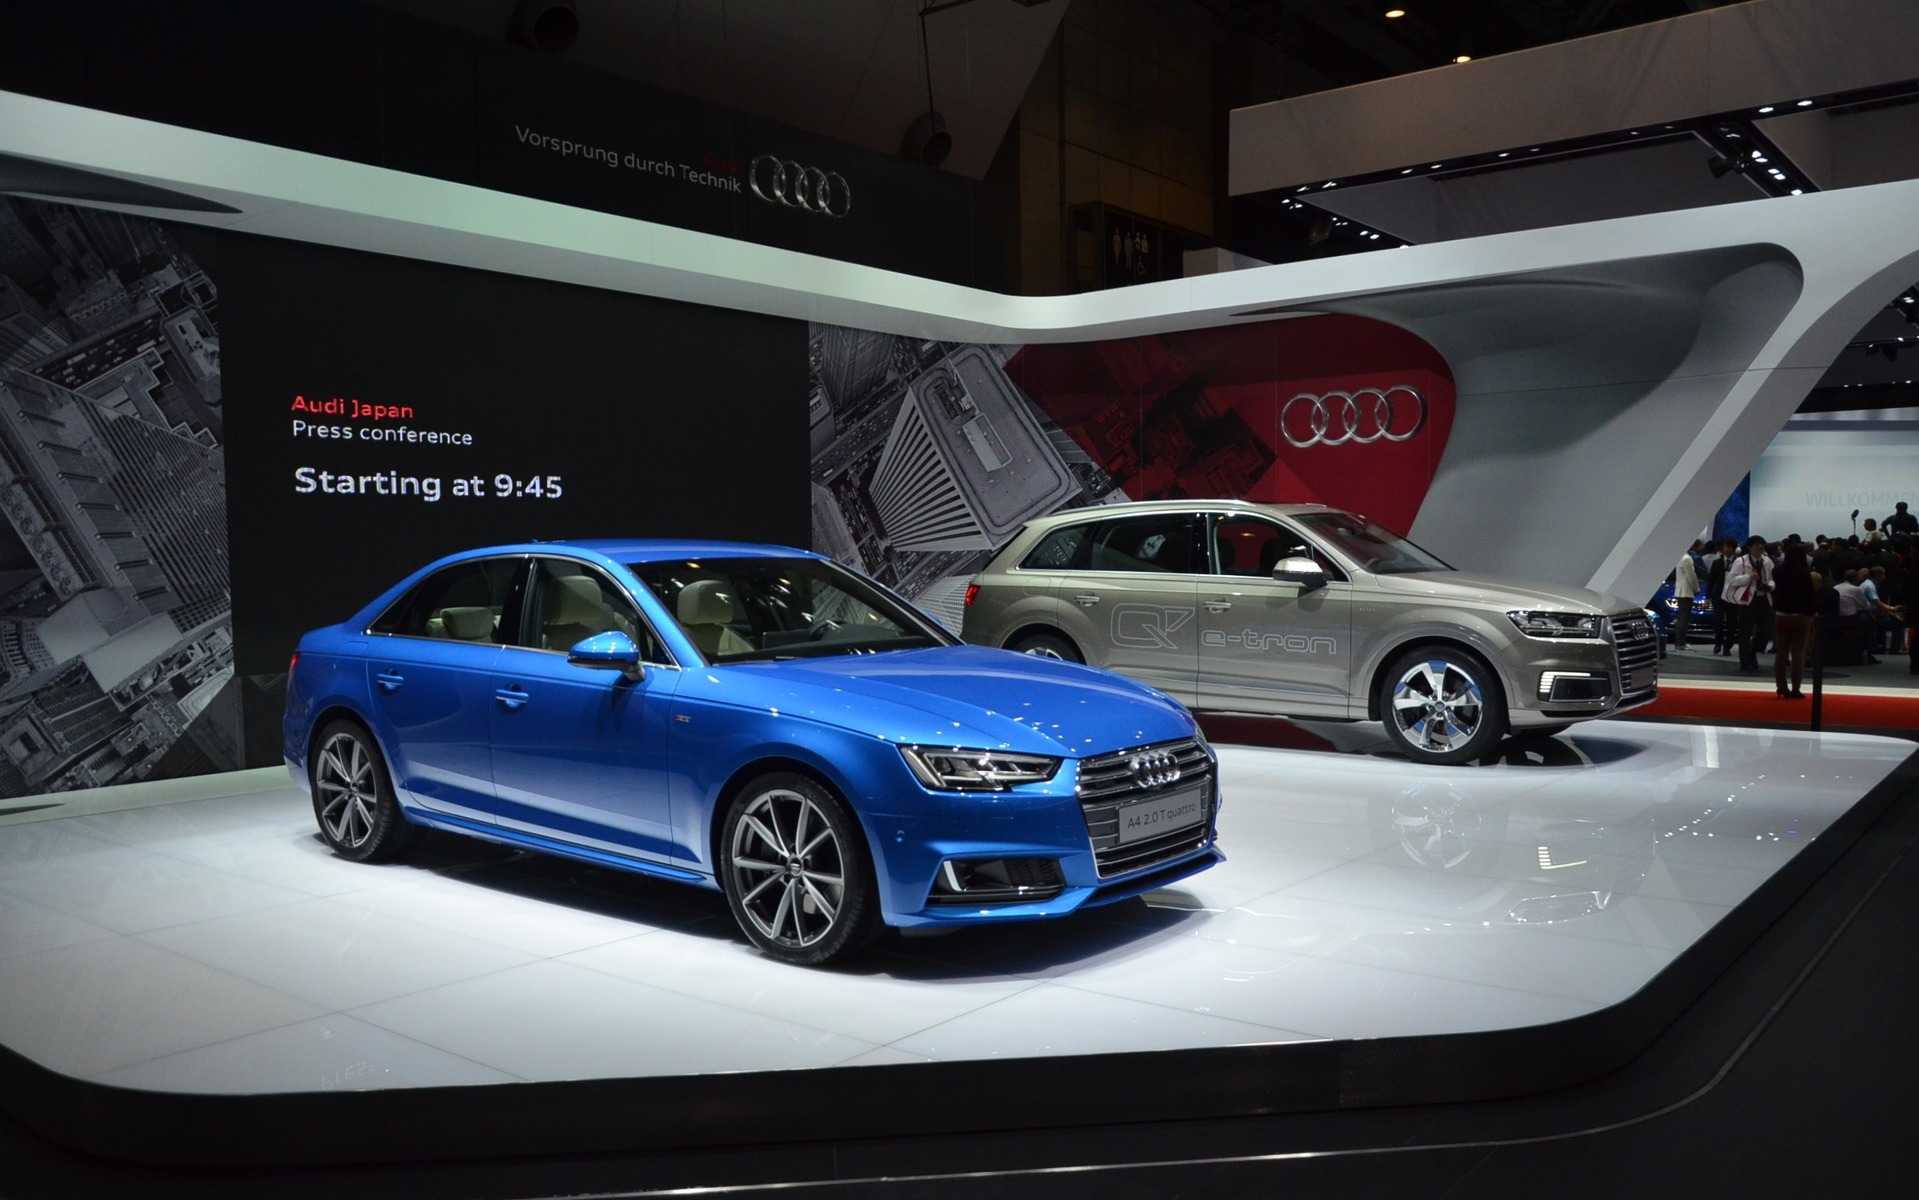 La Audi A4 et le Q7 e-tron quattro au Salon de l'Auto de Tokyo